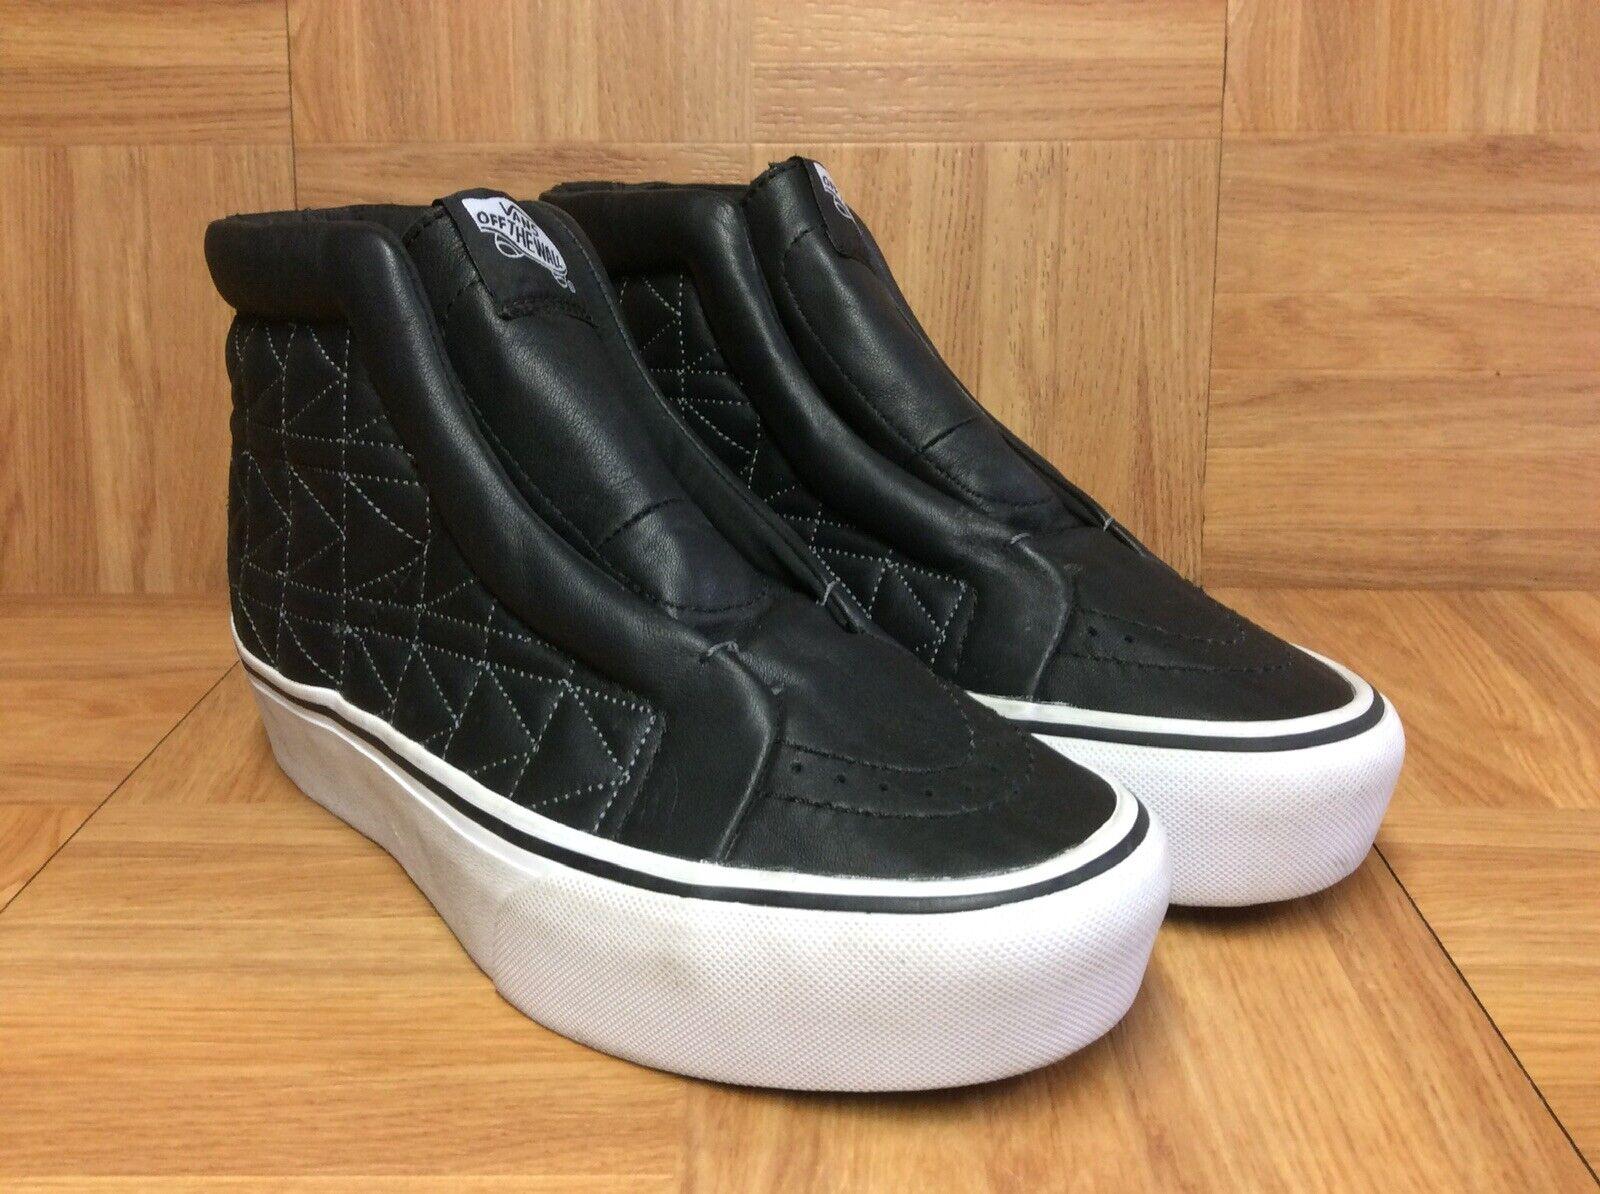 Raro  VANS Sk8-Hi Karl Lagerfeld muestra Zapato Plataforma Antideslizante en Negro Talla 5.5